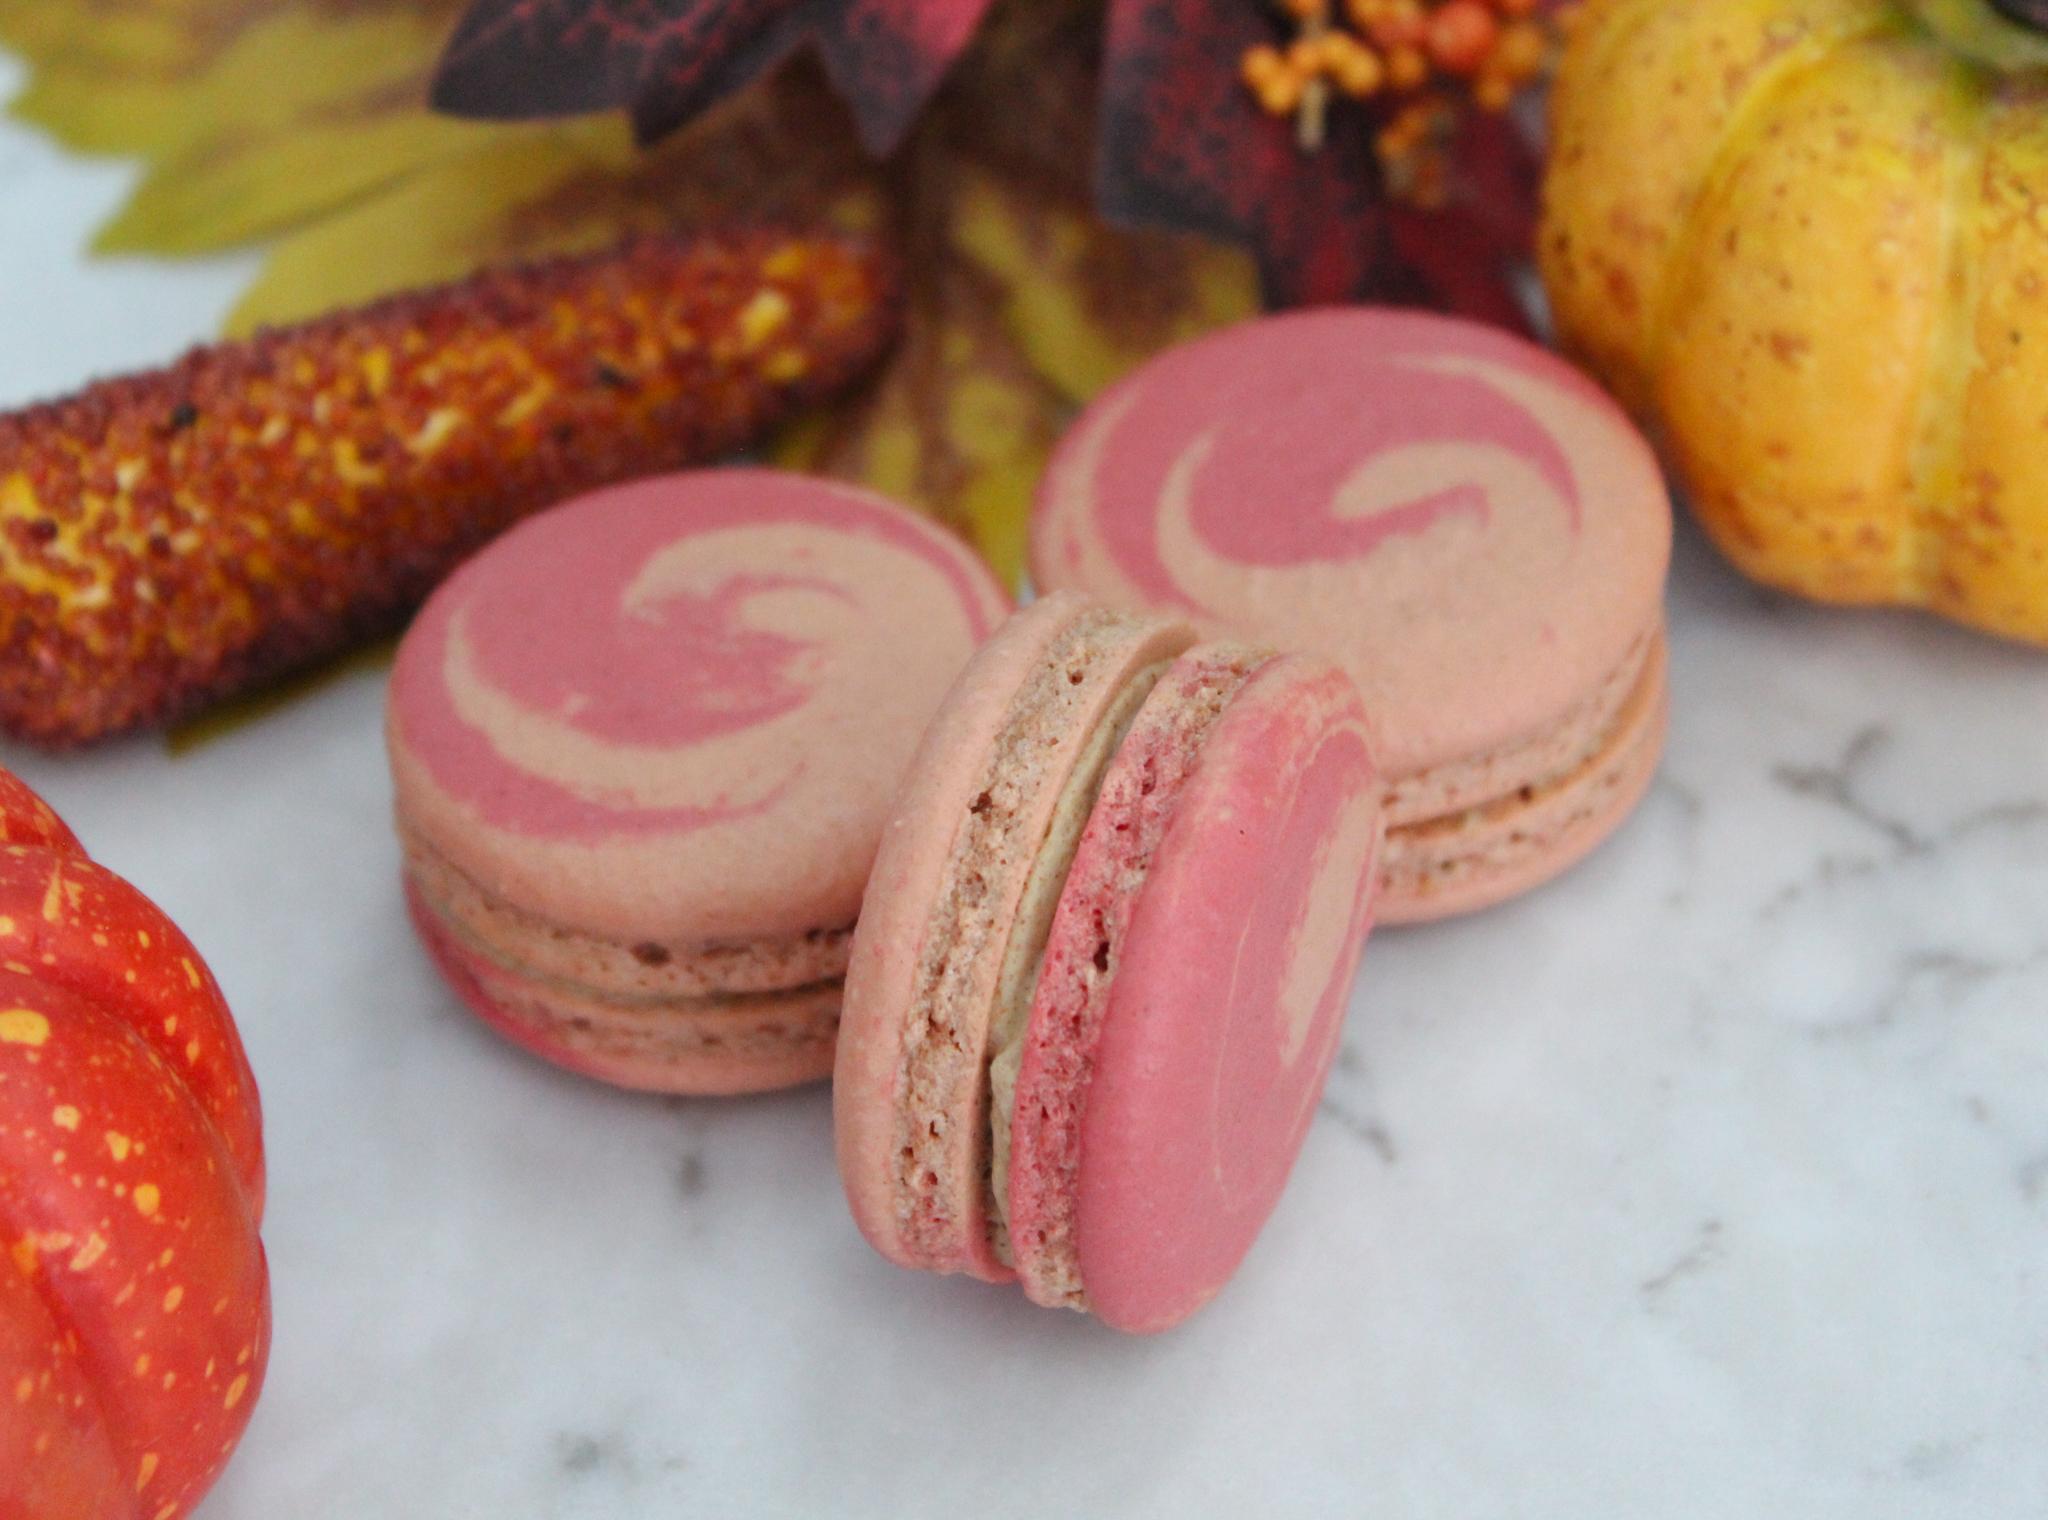 Autumn-Spice Cake Batter